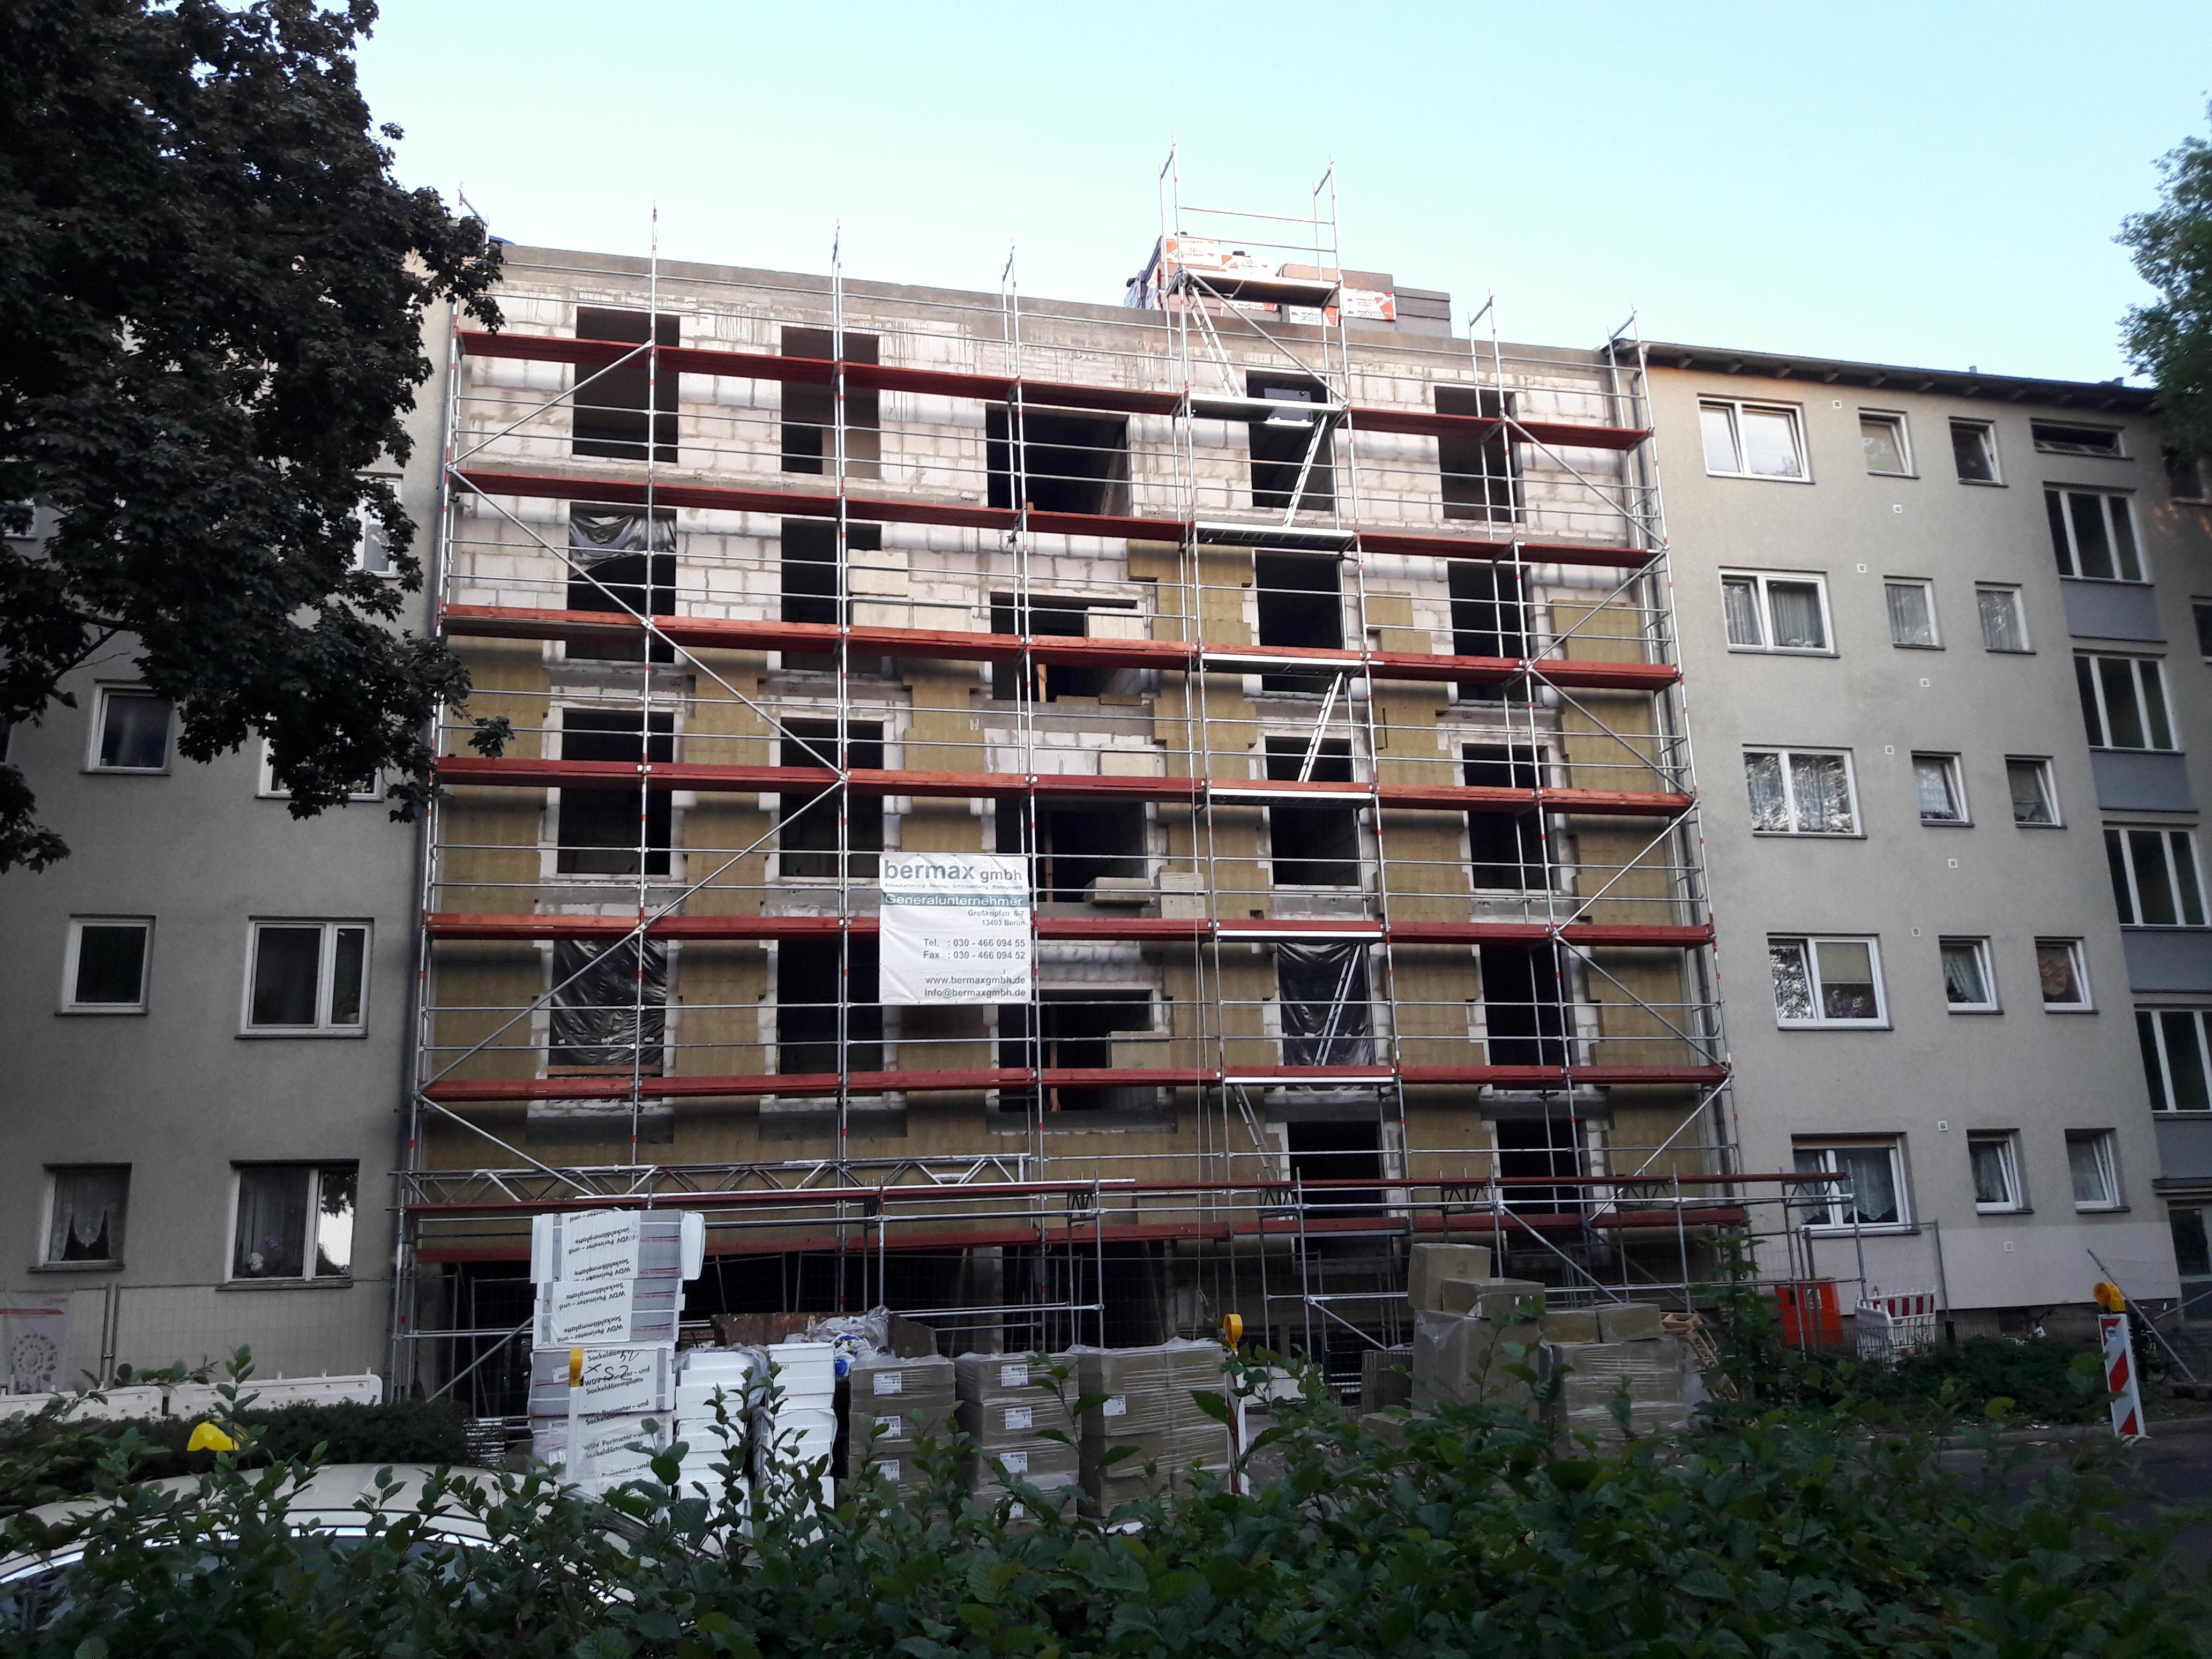 Reginhardstrasse-Neubau.jpg